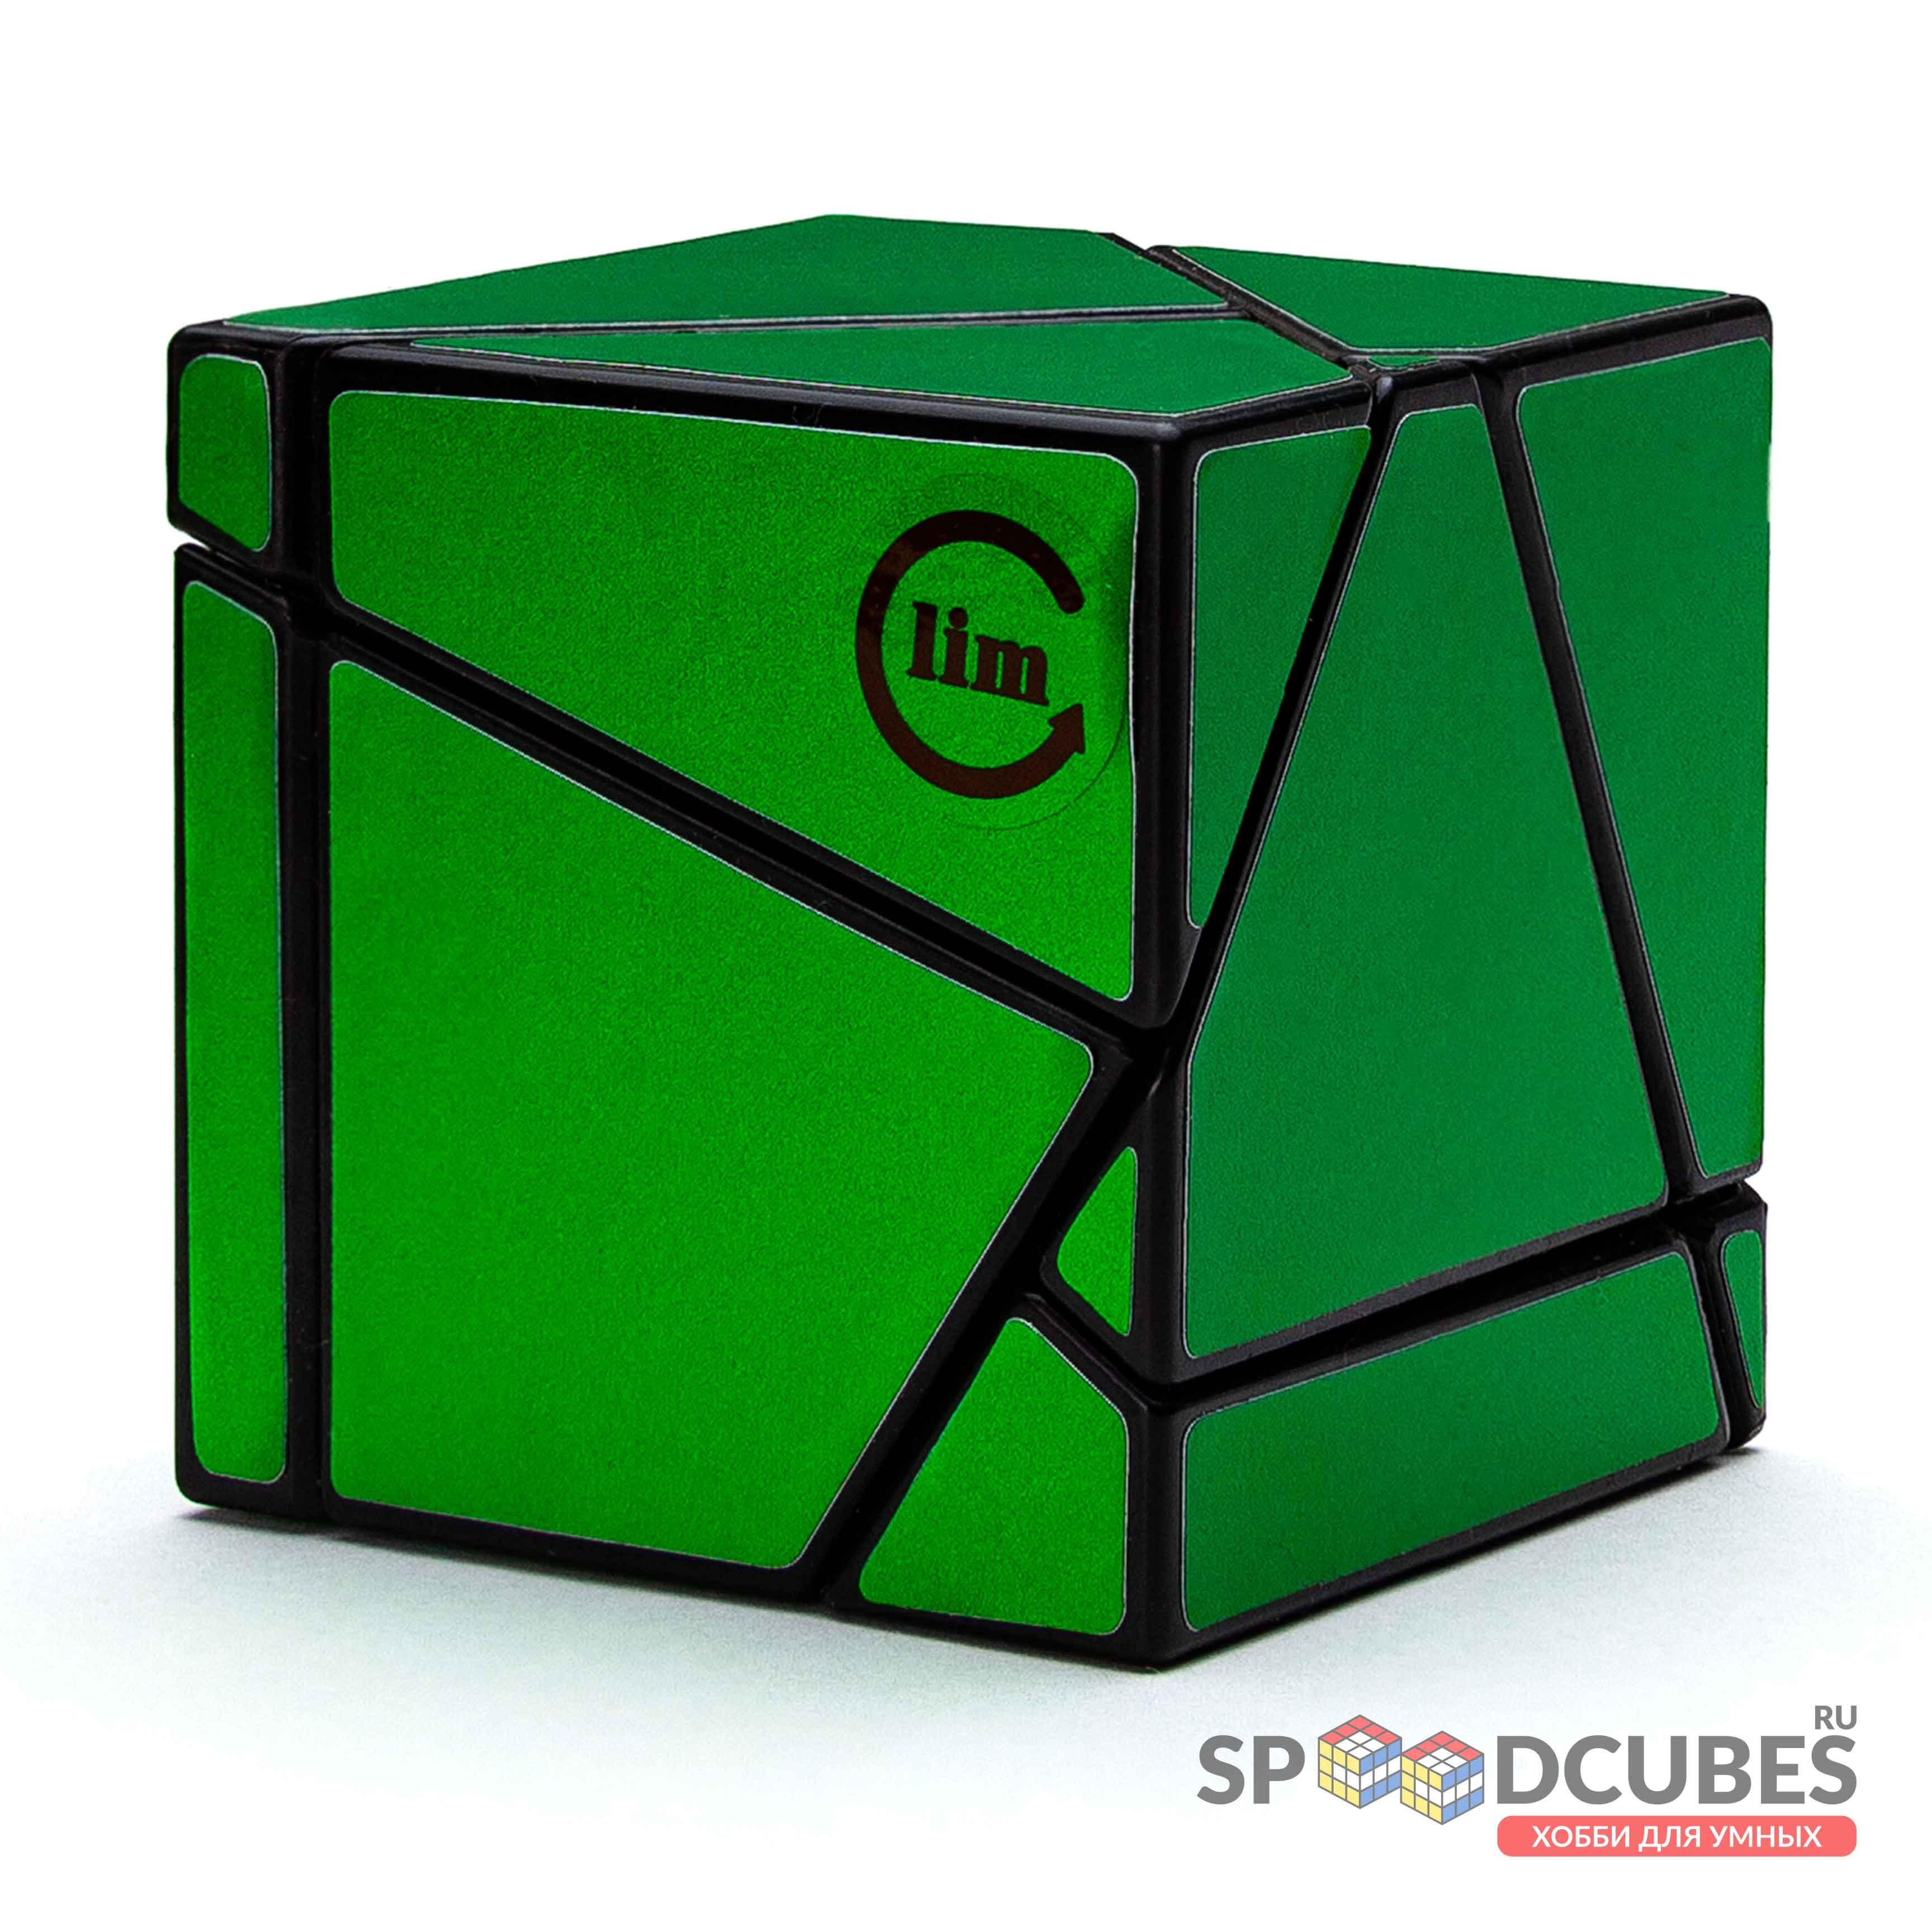 Fangshi Lim Ghost 2x2 Cube